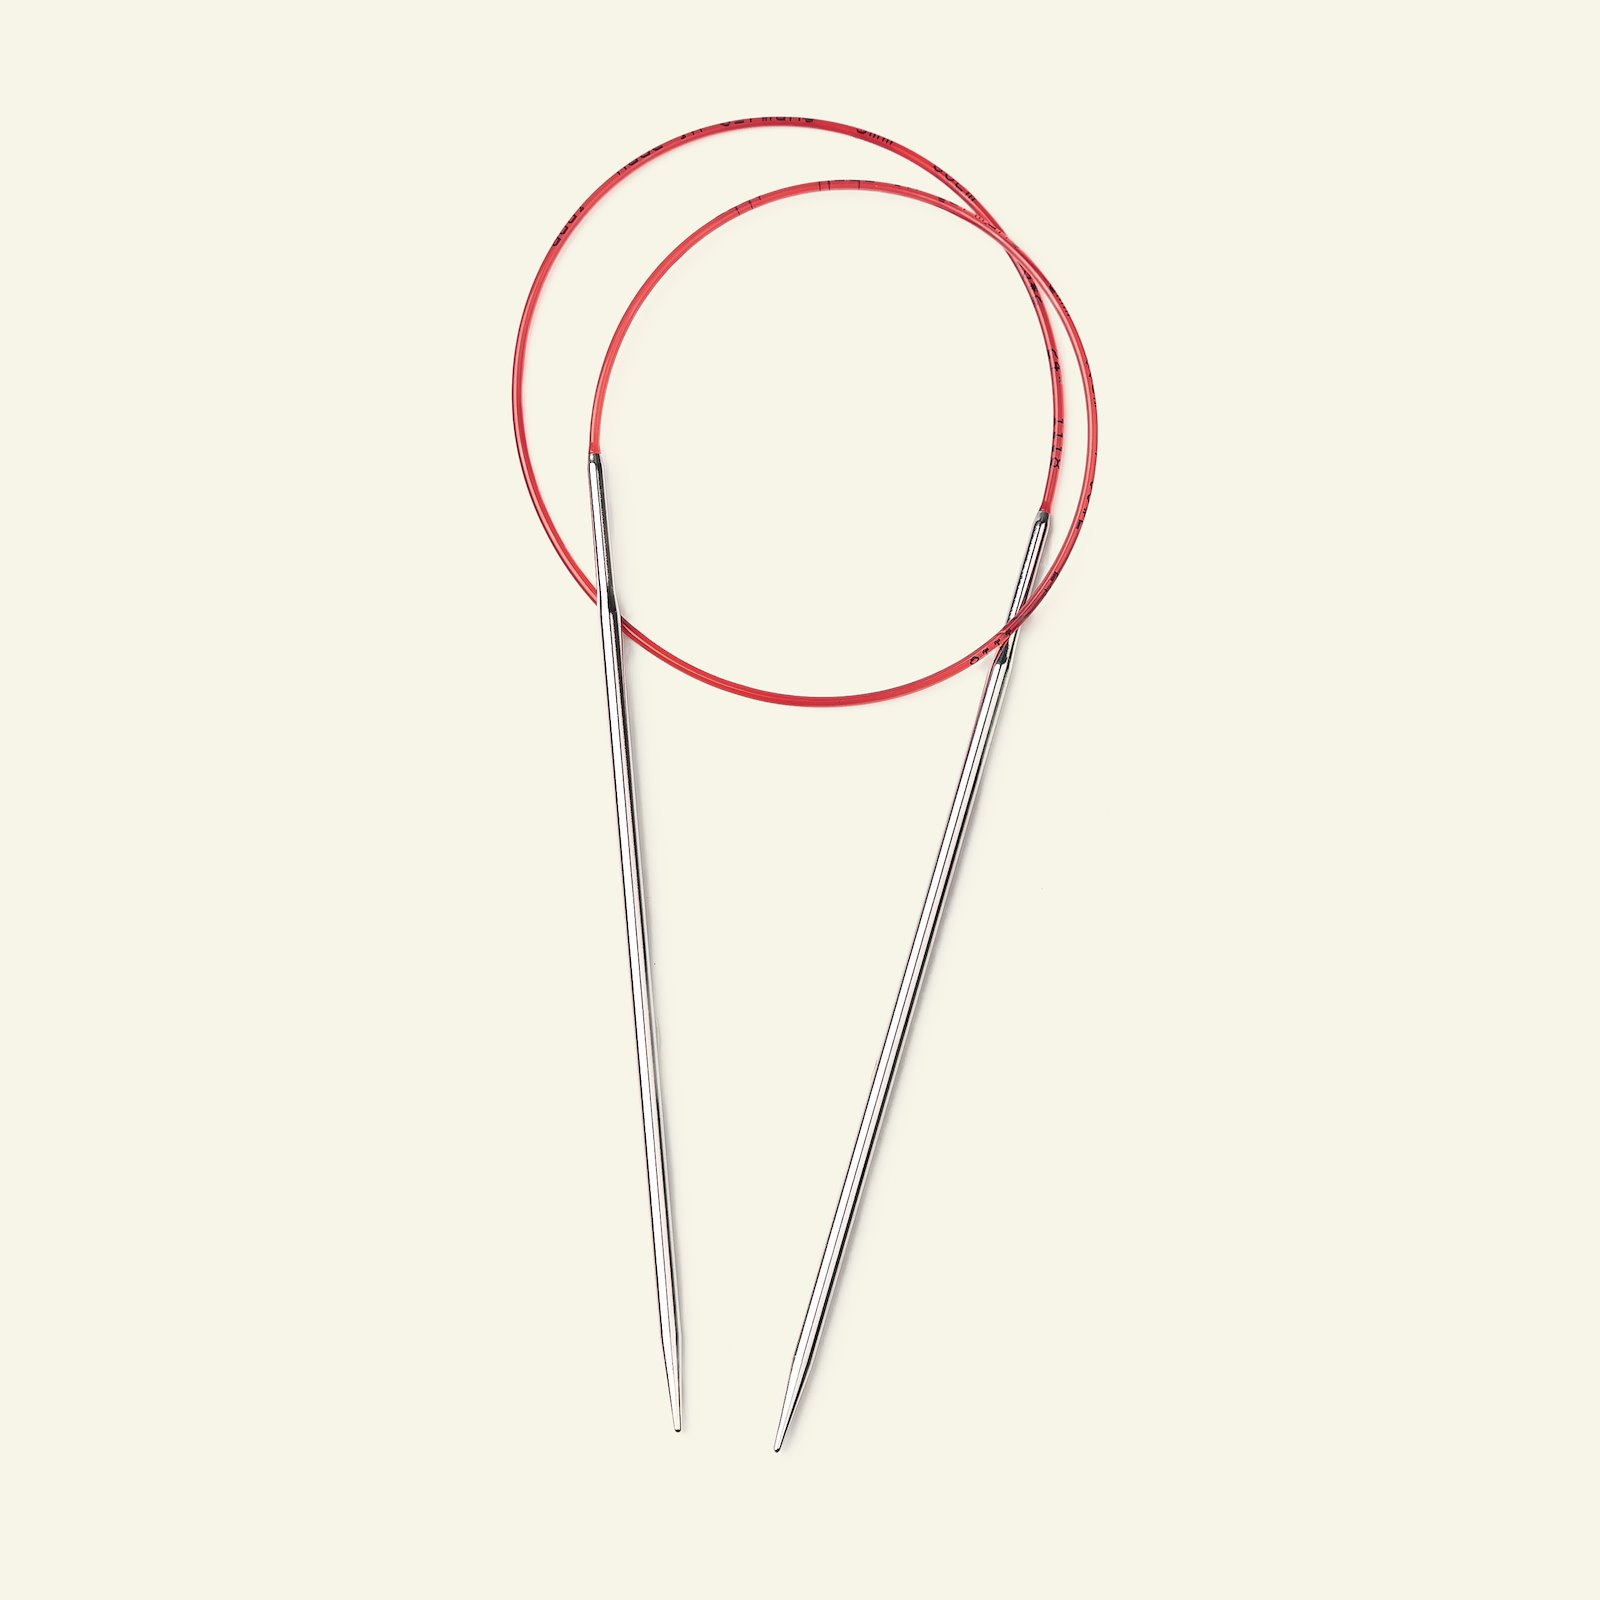 Addi Lace circular needle 60cm 3mm 83193_pack